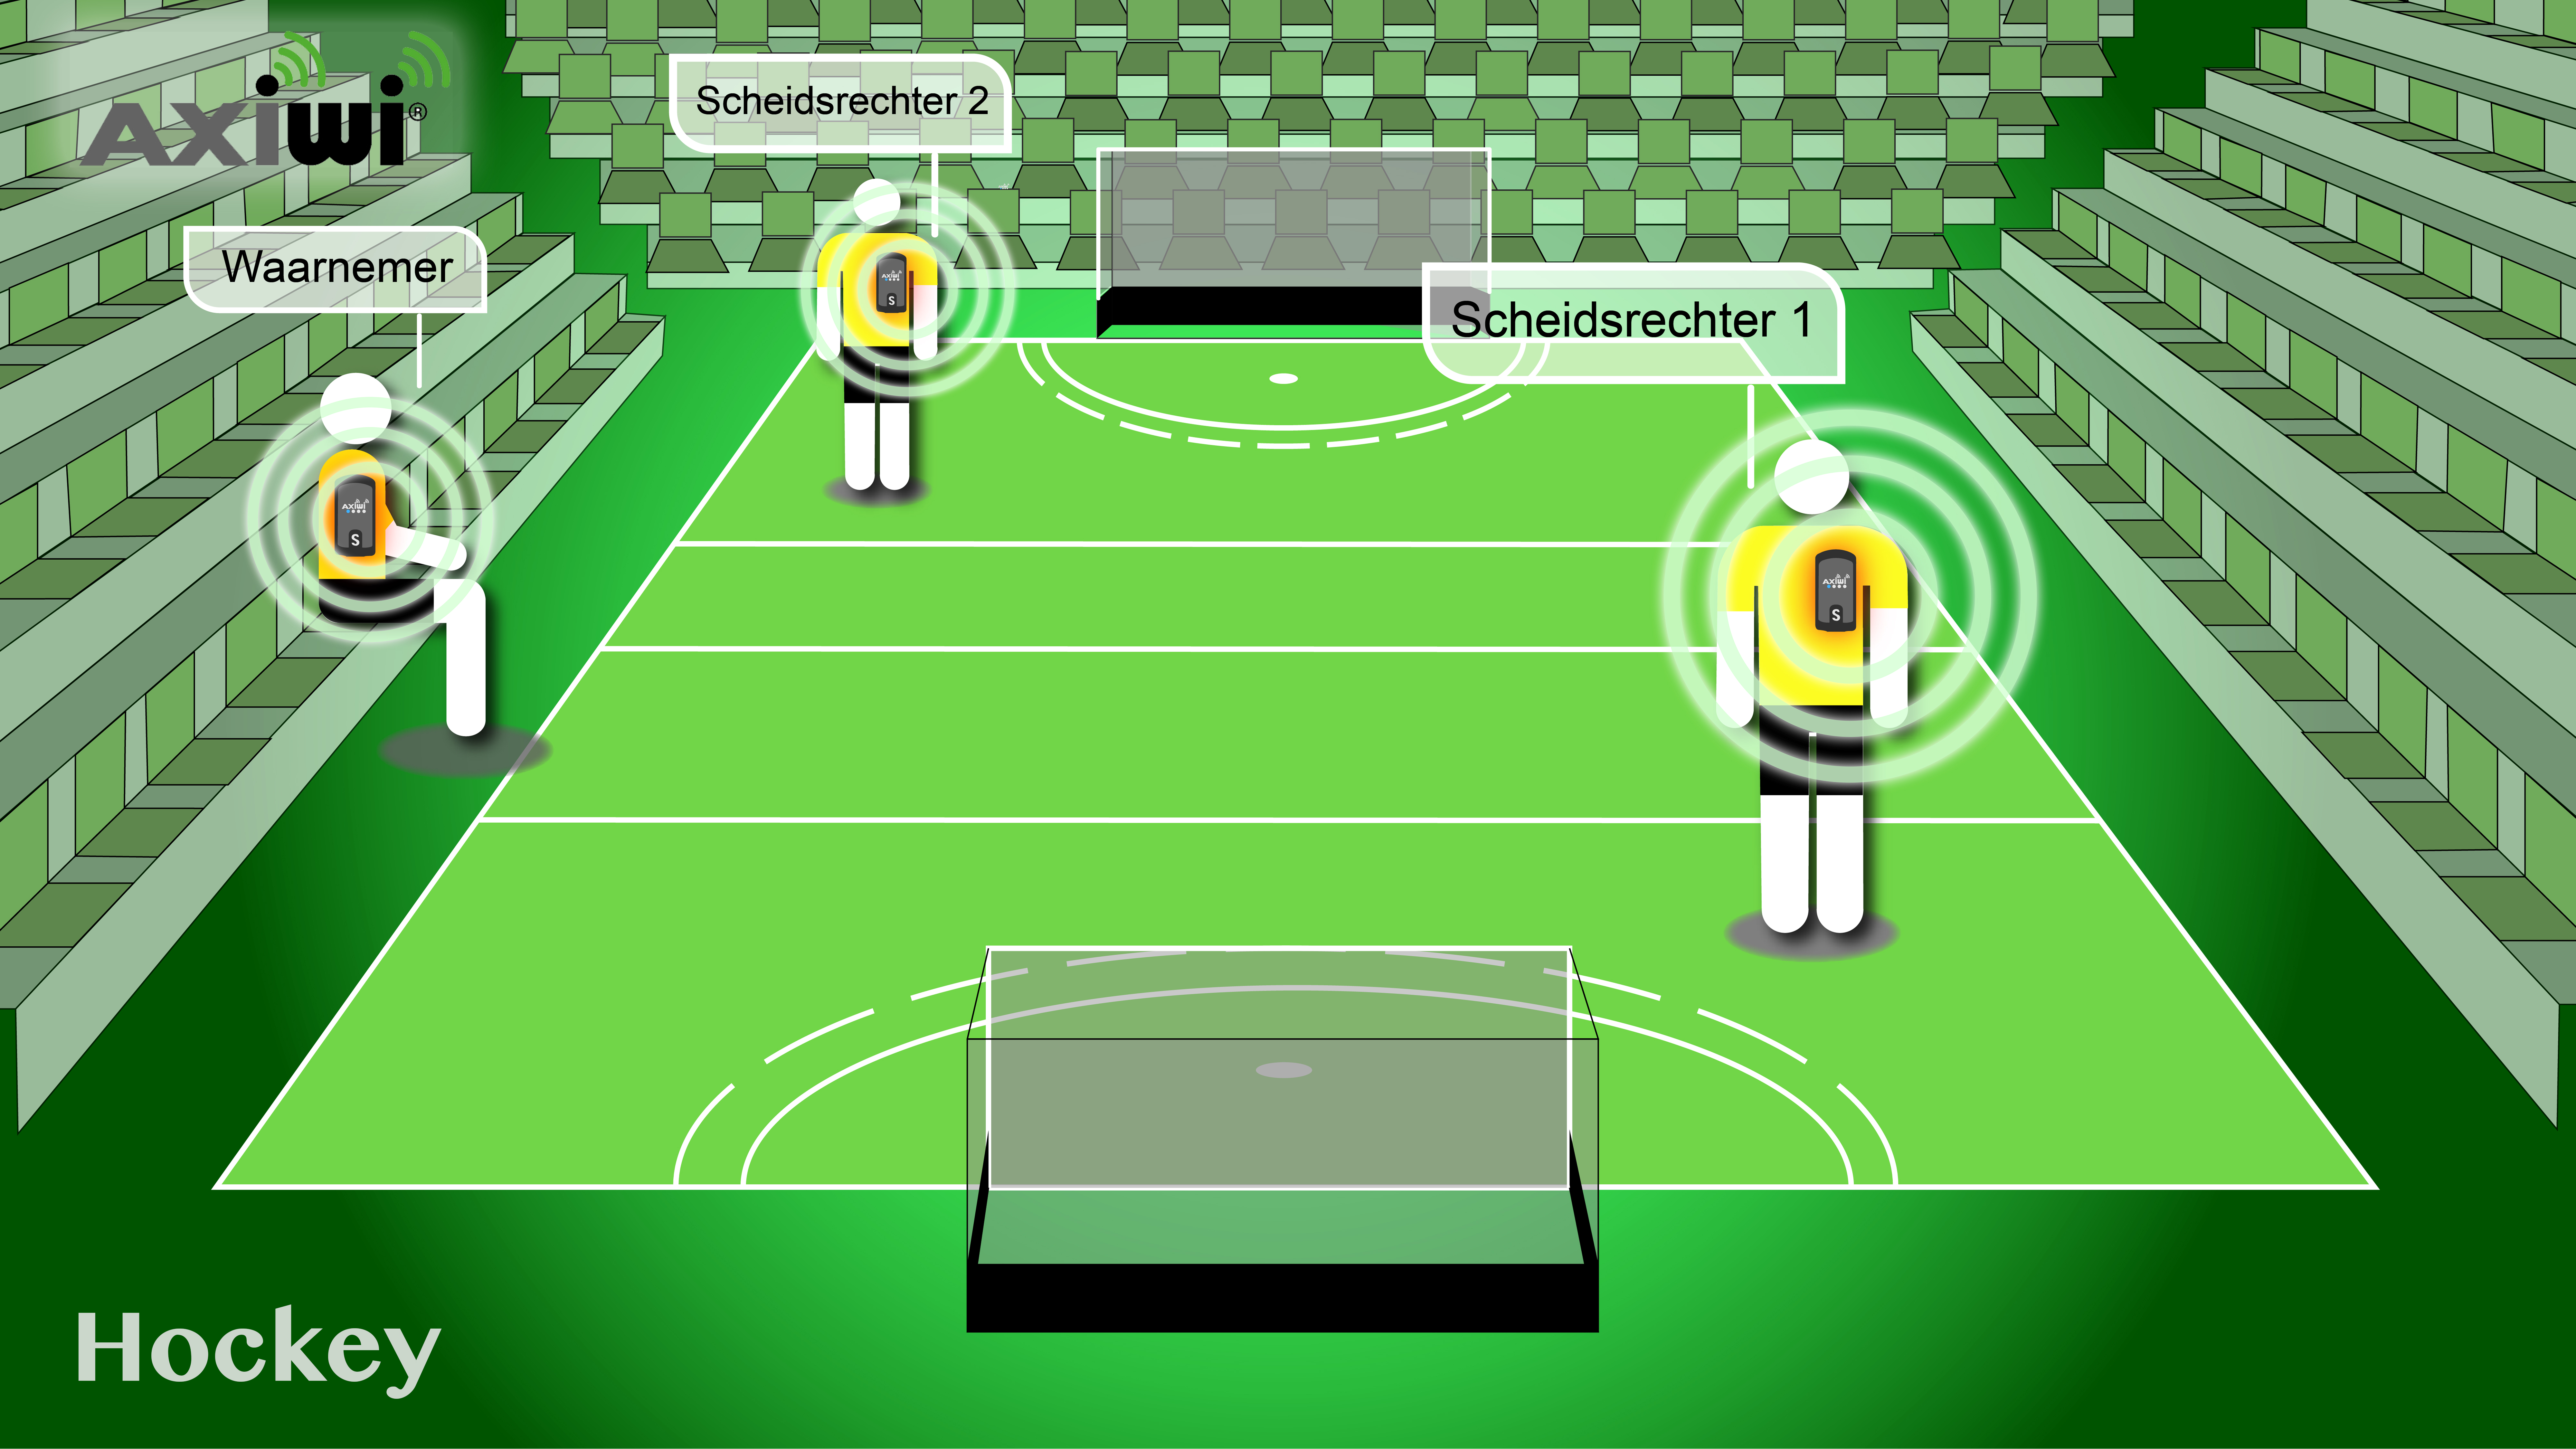 axiwi-communicatie-systeem-scheidsrechter-hockey